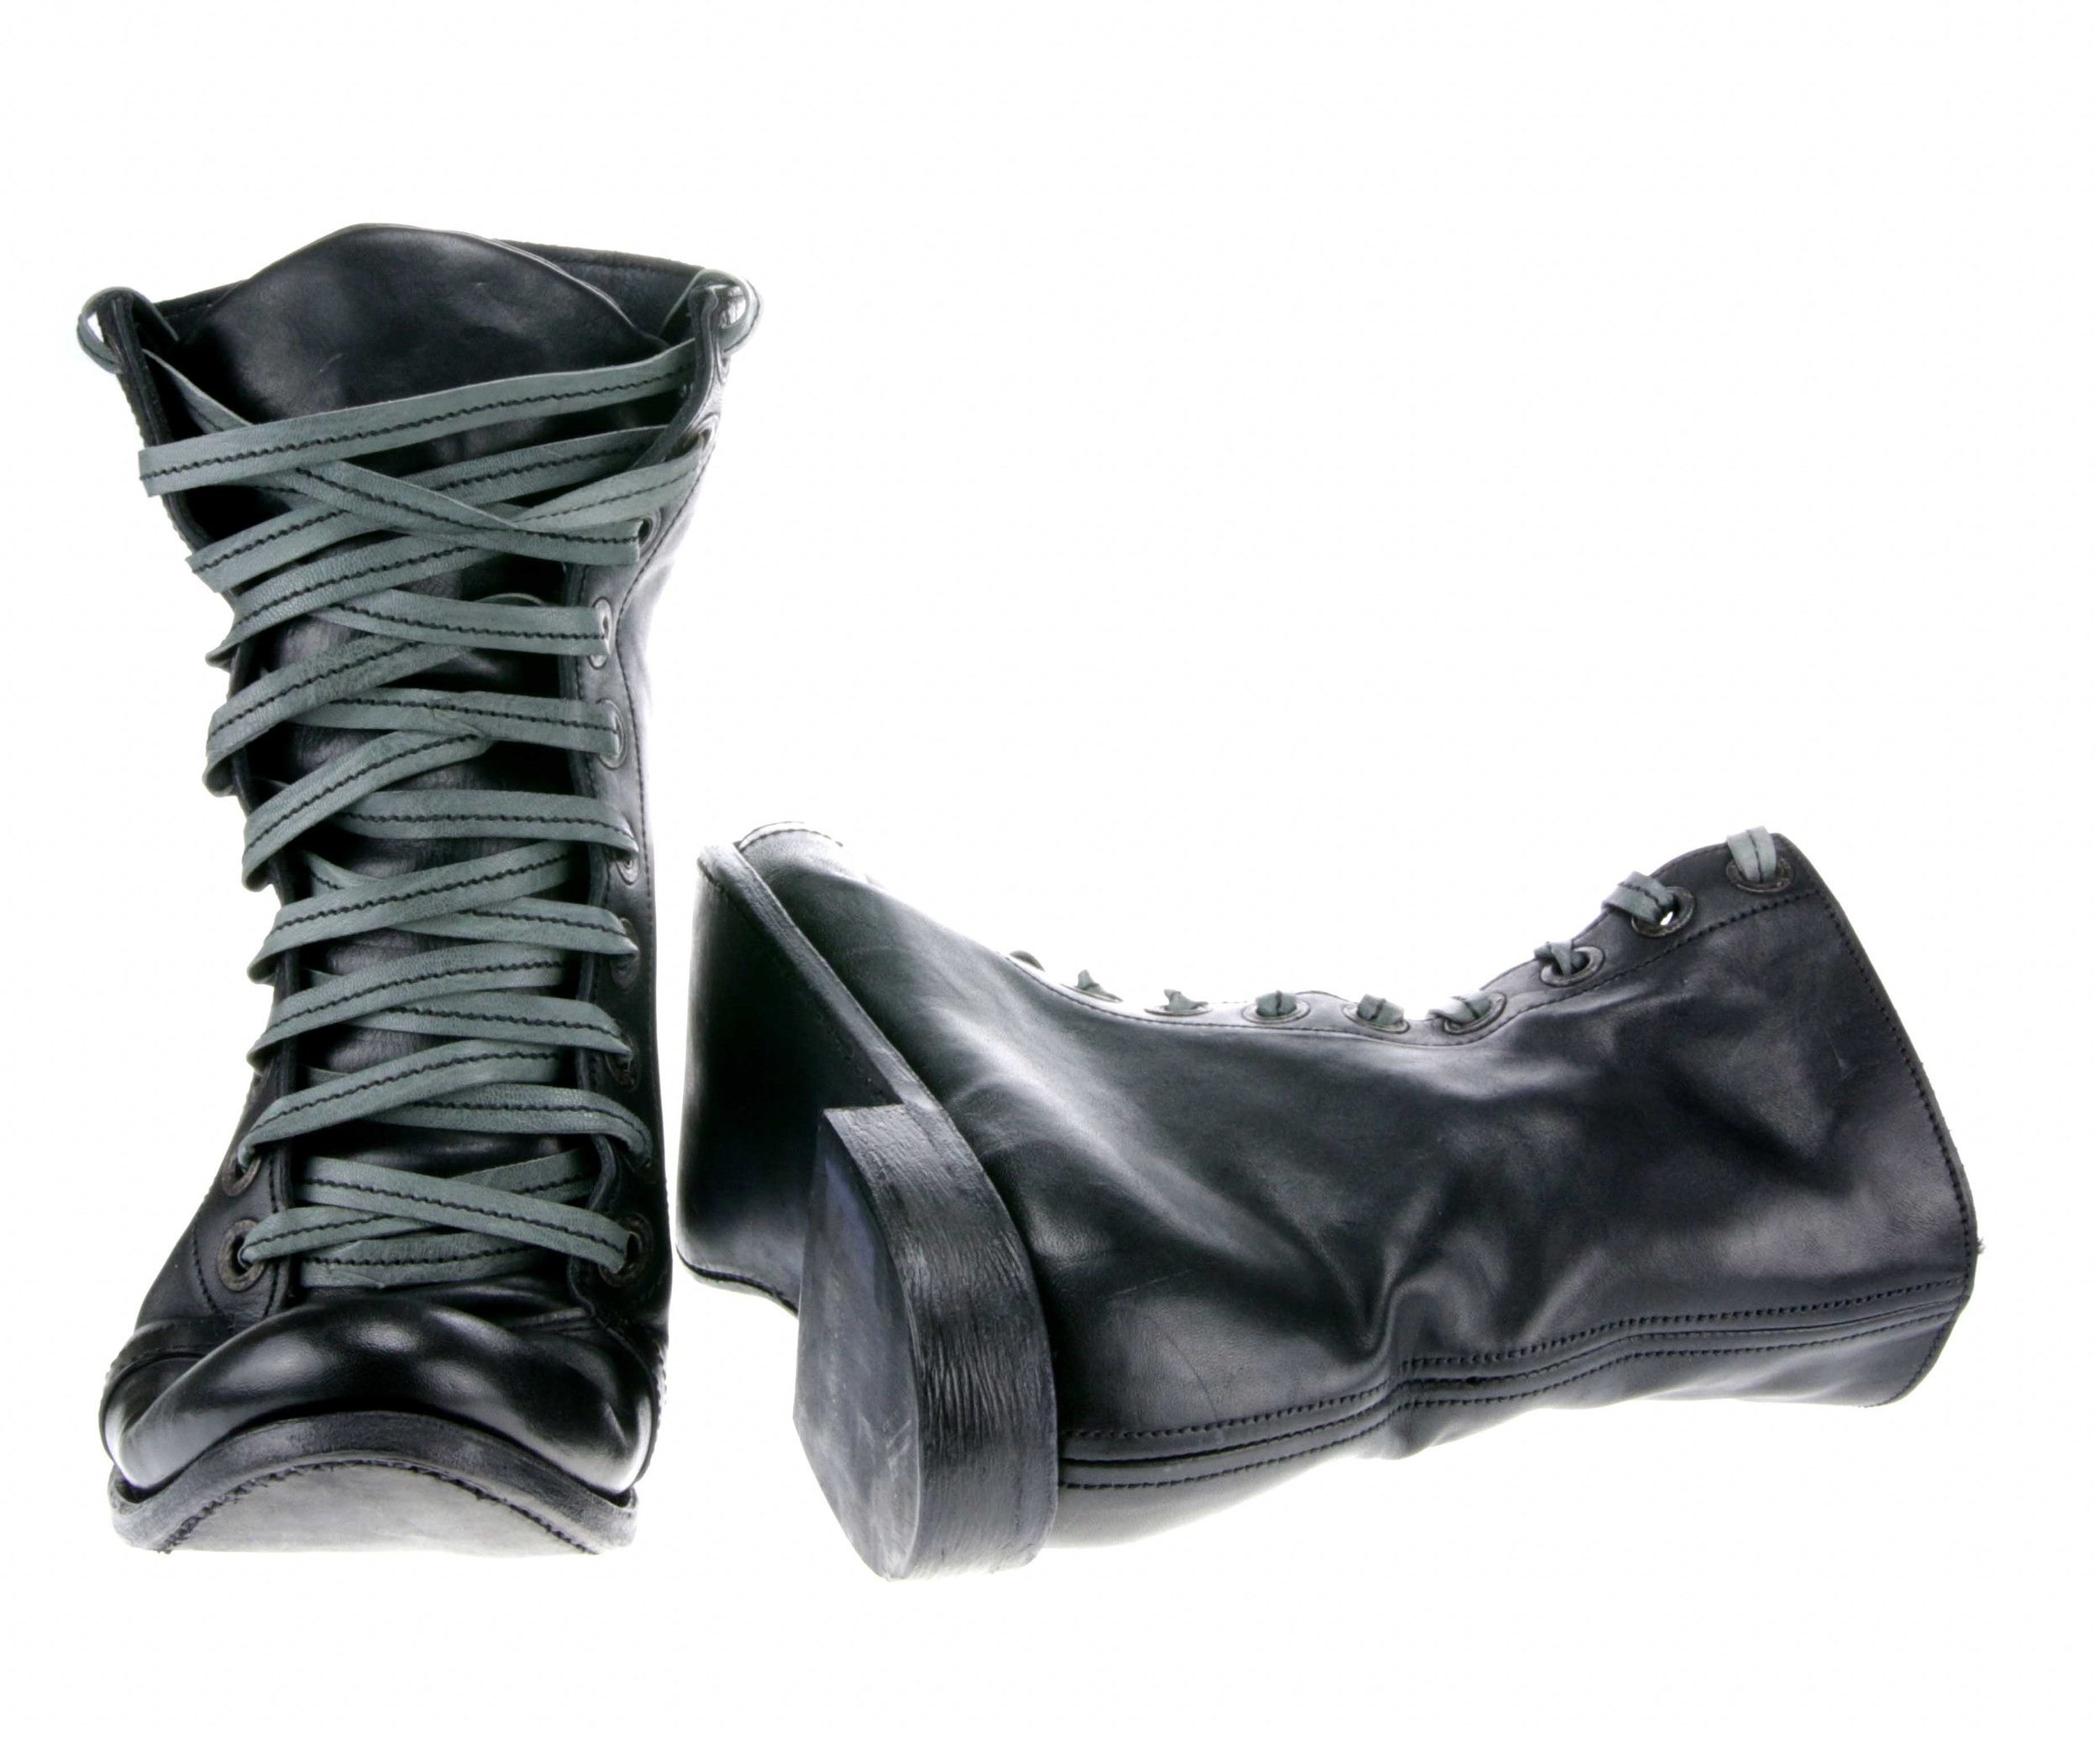 10Hole Work Boot Black Front Inside.jpg